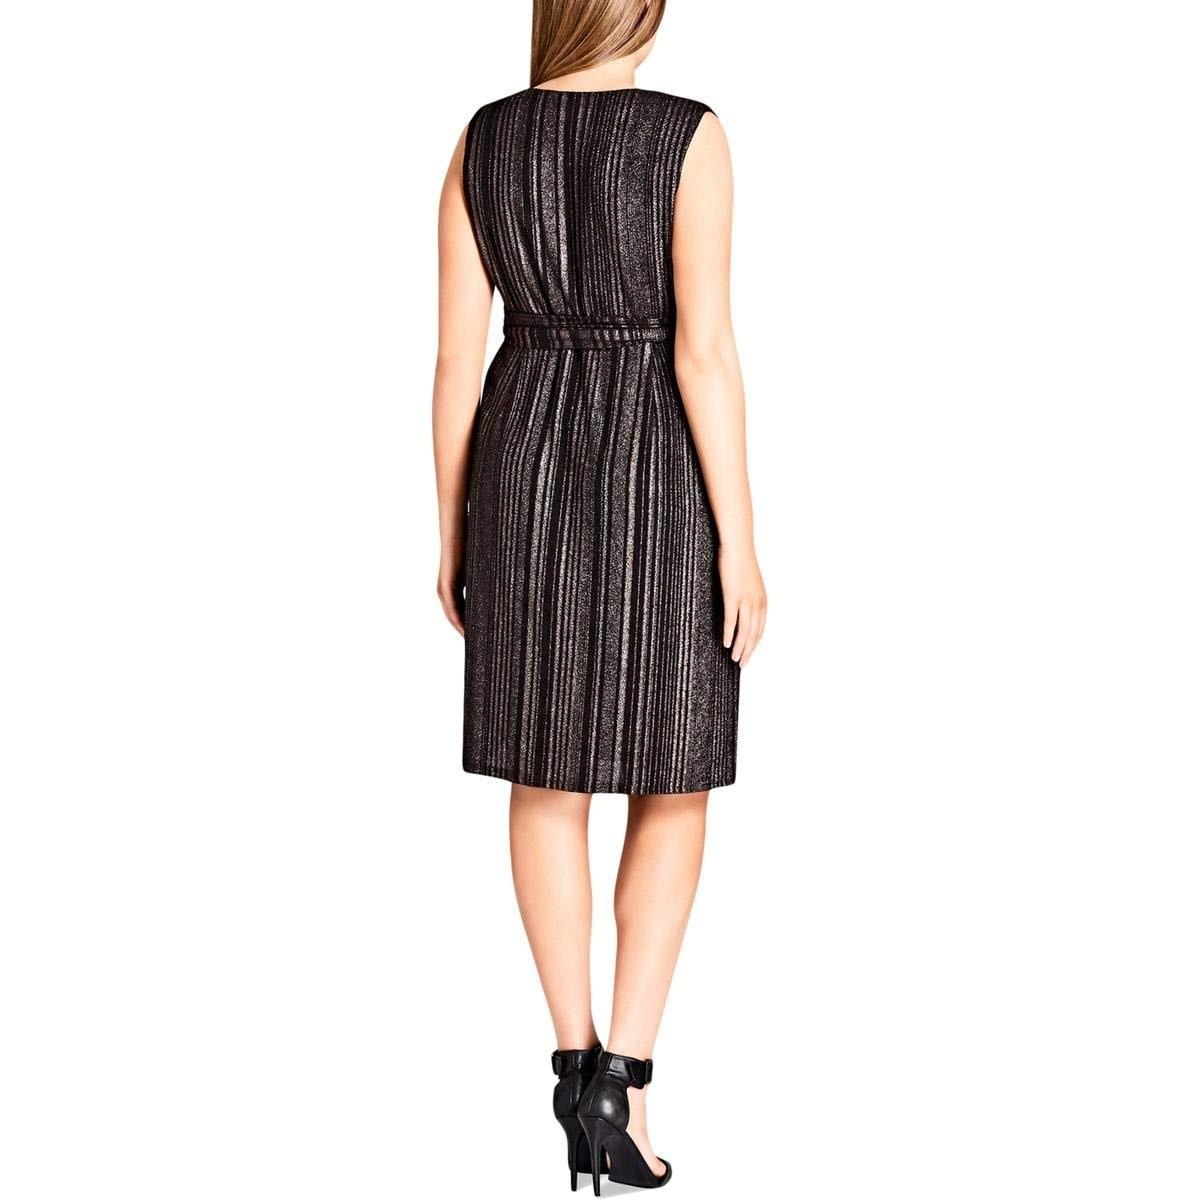 1f653f5ea3 Shop City Chic Black Womens XL 22 Plus Metallic Tie-Waist Sheath Dress - On  Sale - Free Shipping On Orders Over  45 - Overstock - 27342179